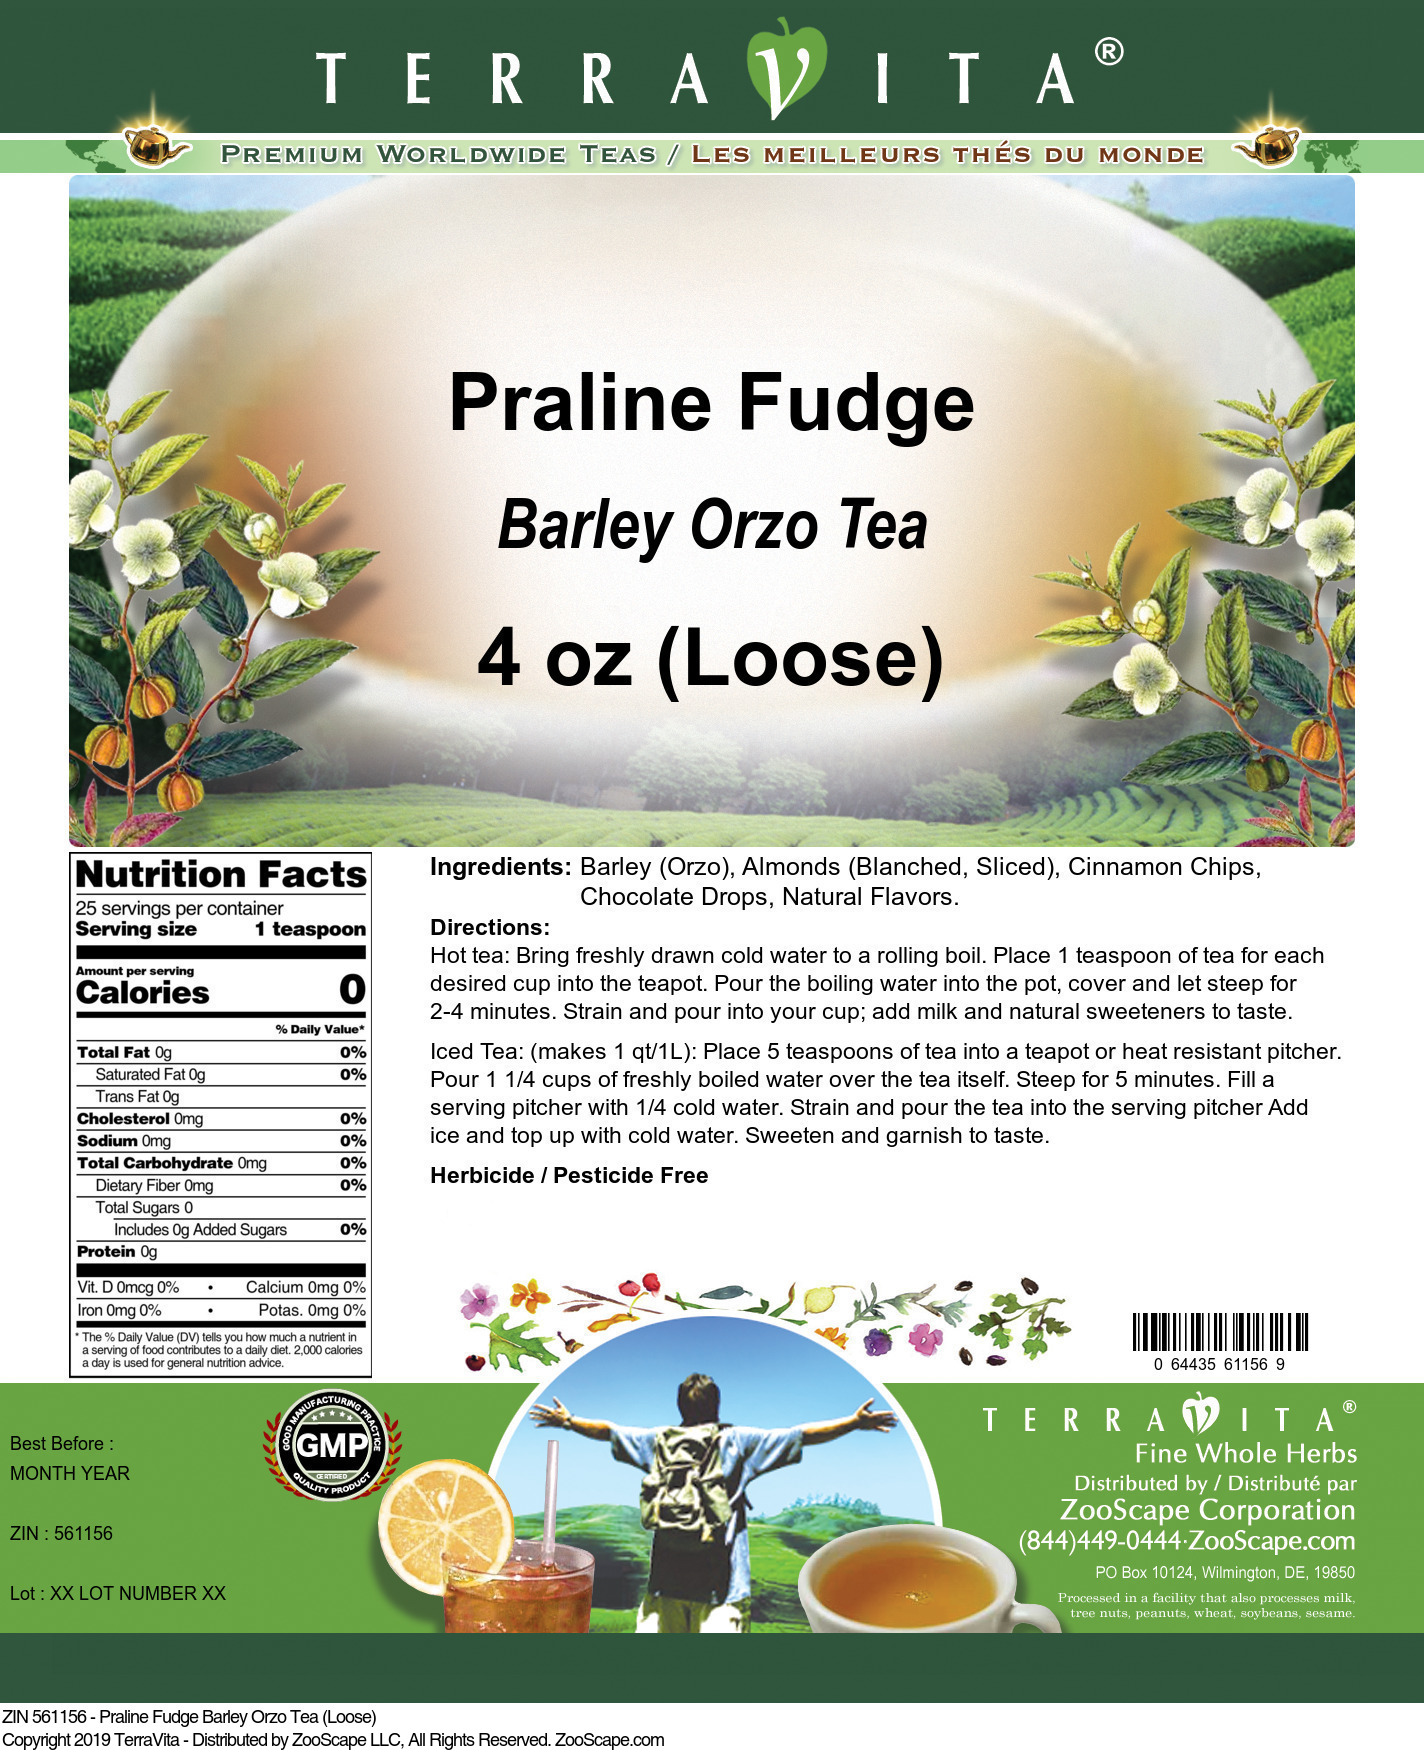 Praline Fudge Barley Orzo Tea (Loose)